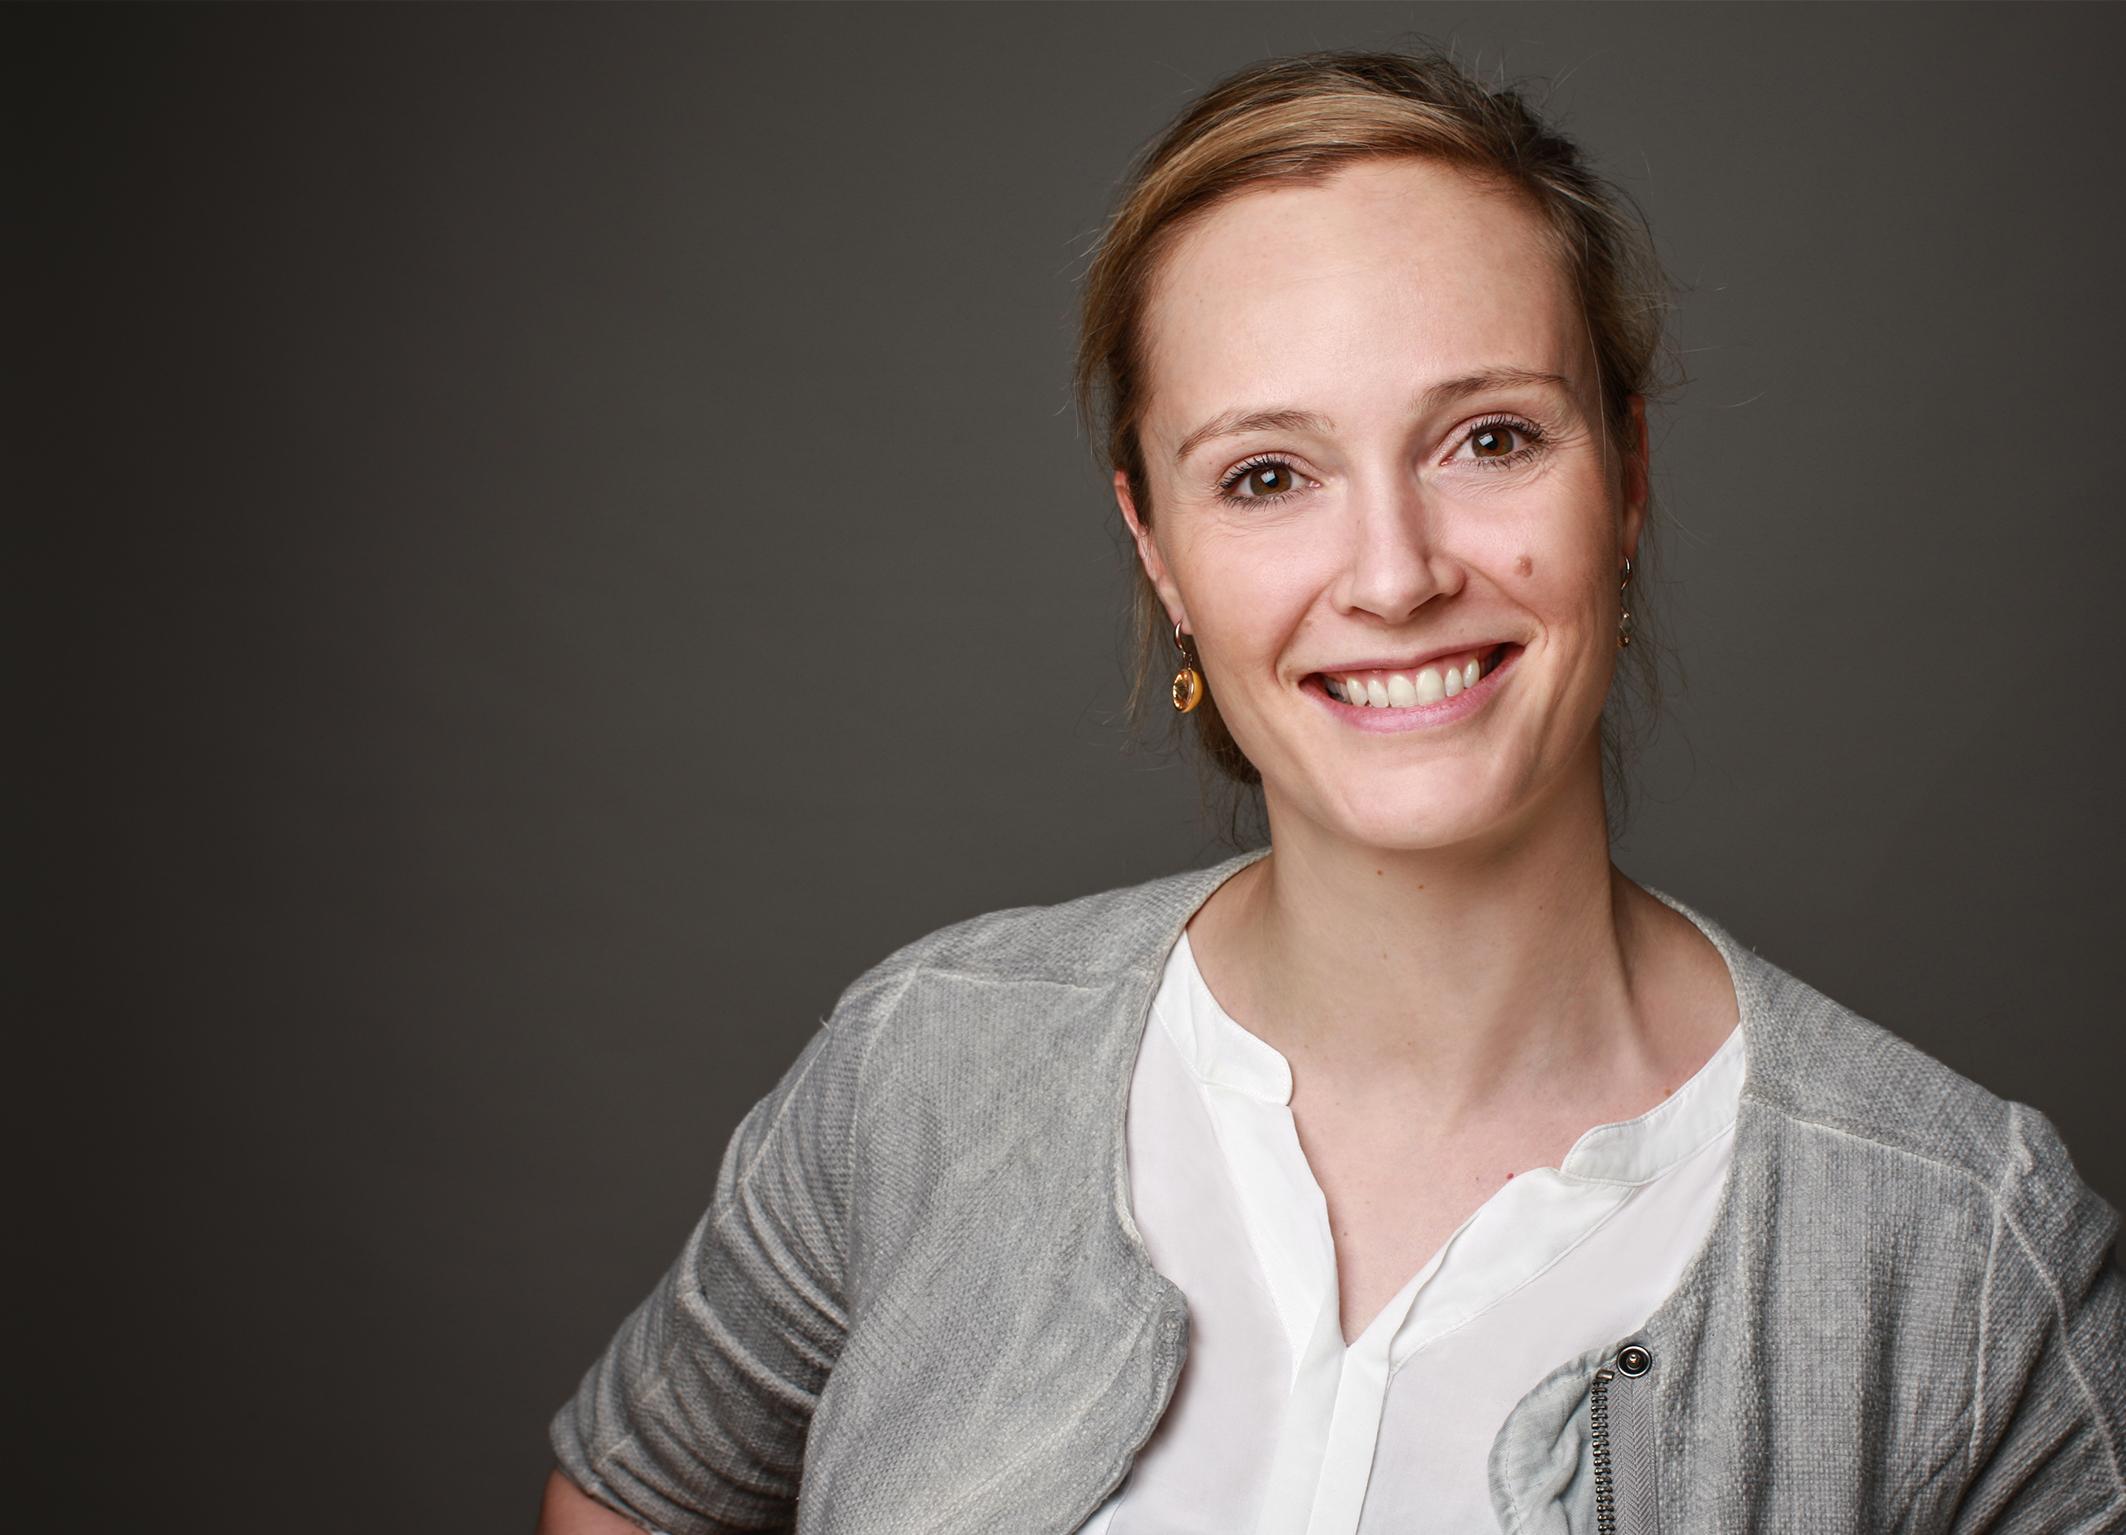 Hanna Obersteller | yellow corner - Coaching. Consulting. Interim CFO.